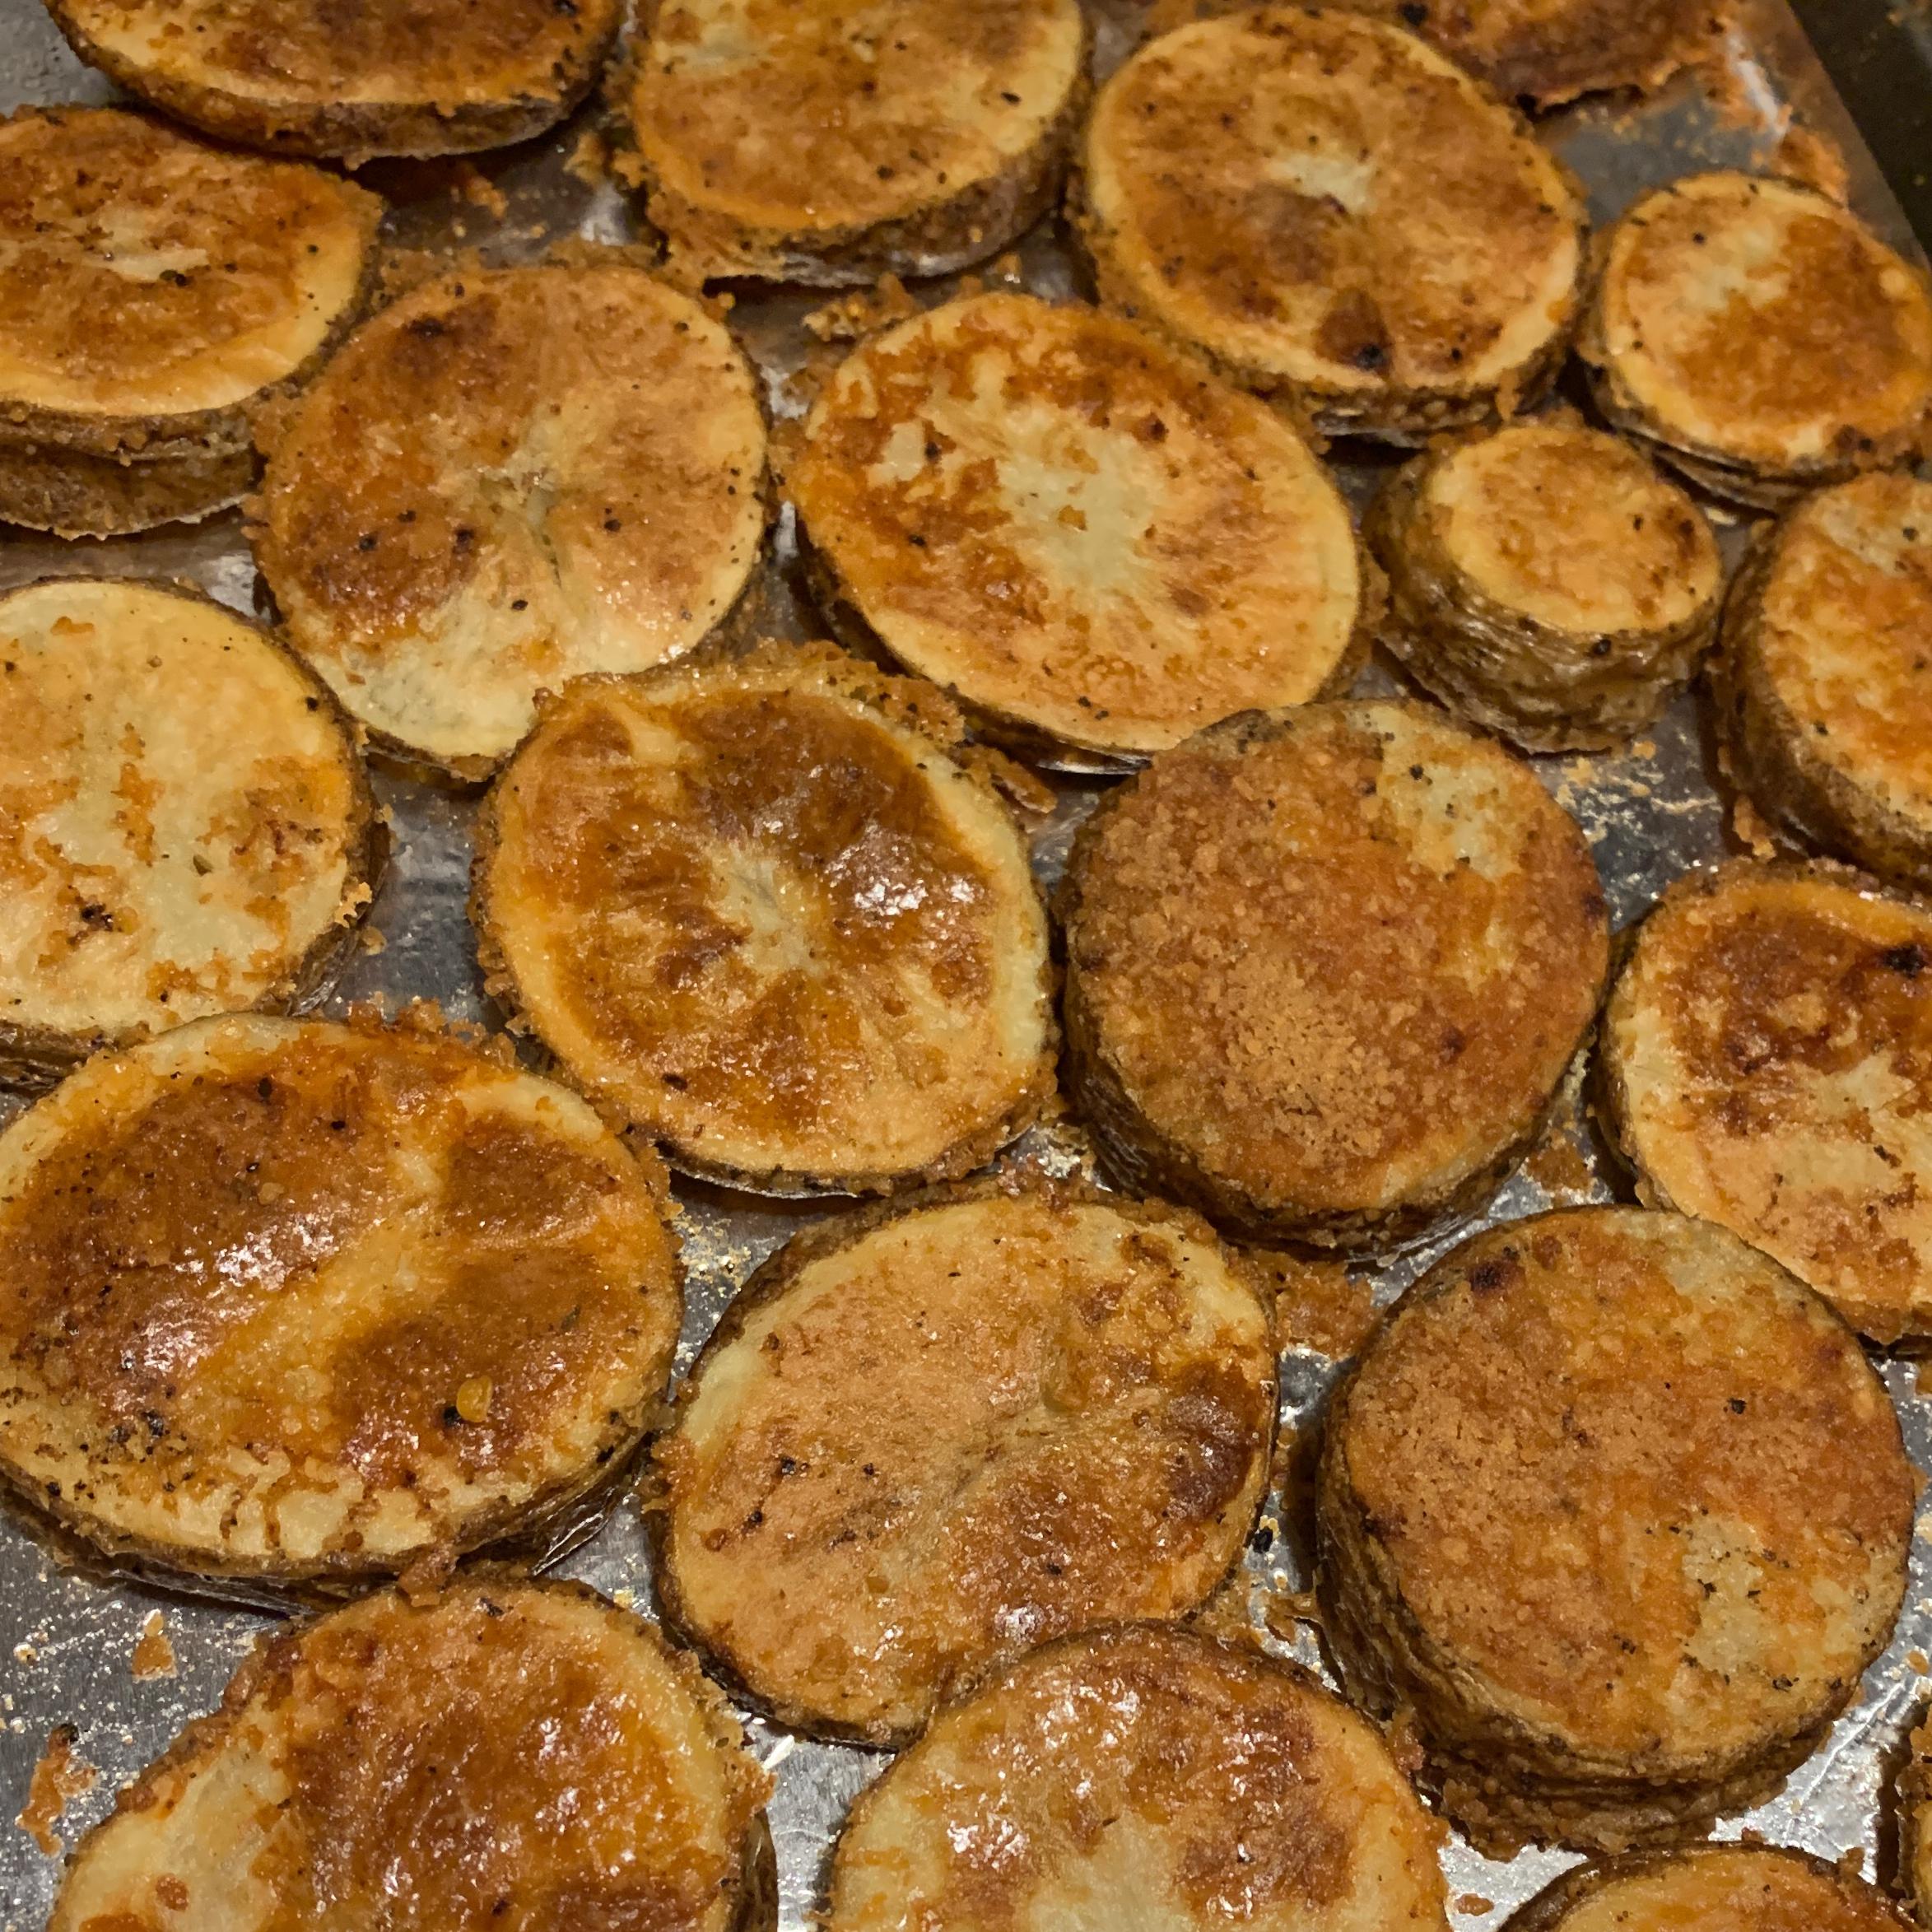 Kristen's Parmesan Roasted Potatoes laken jenkins